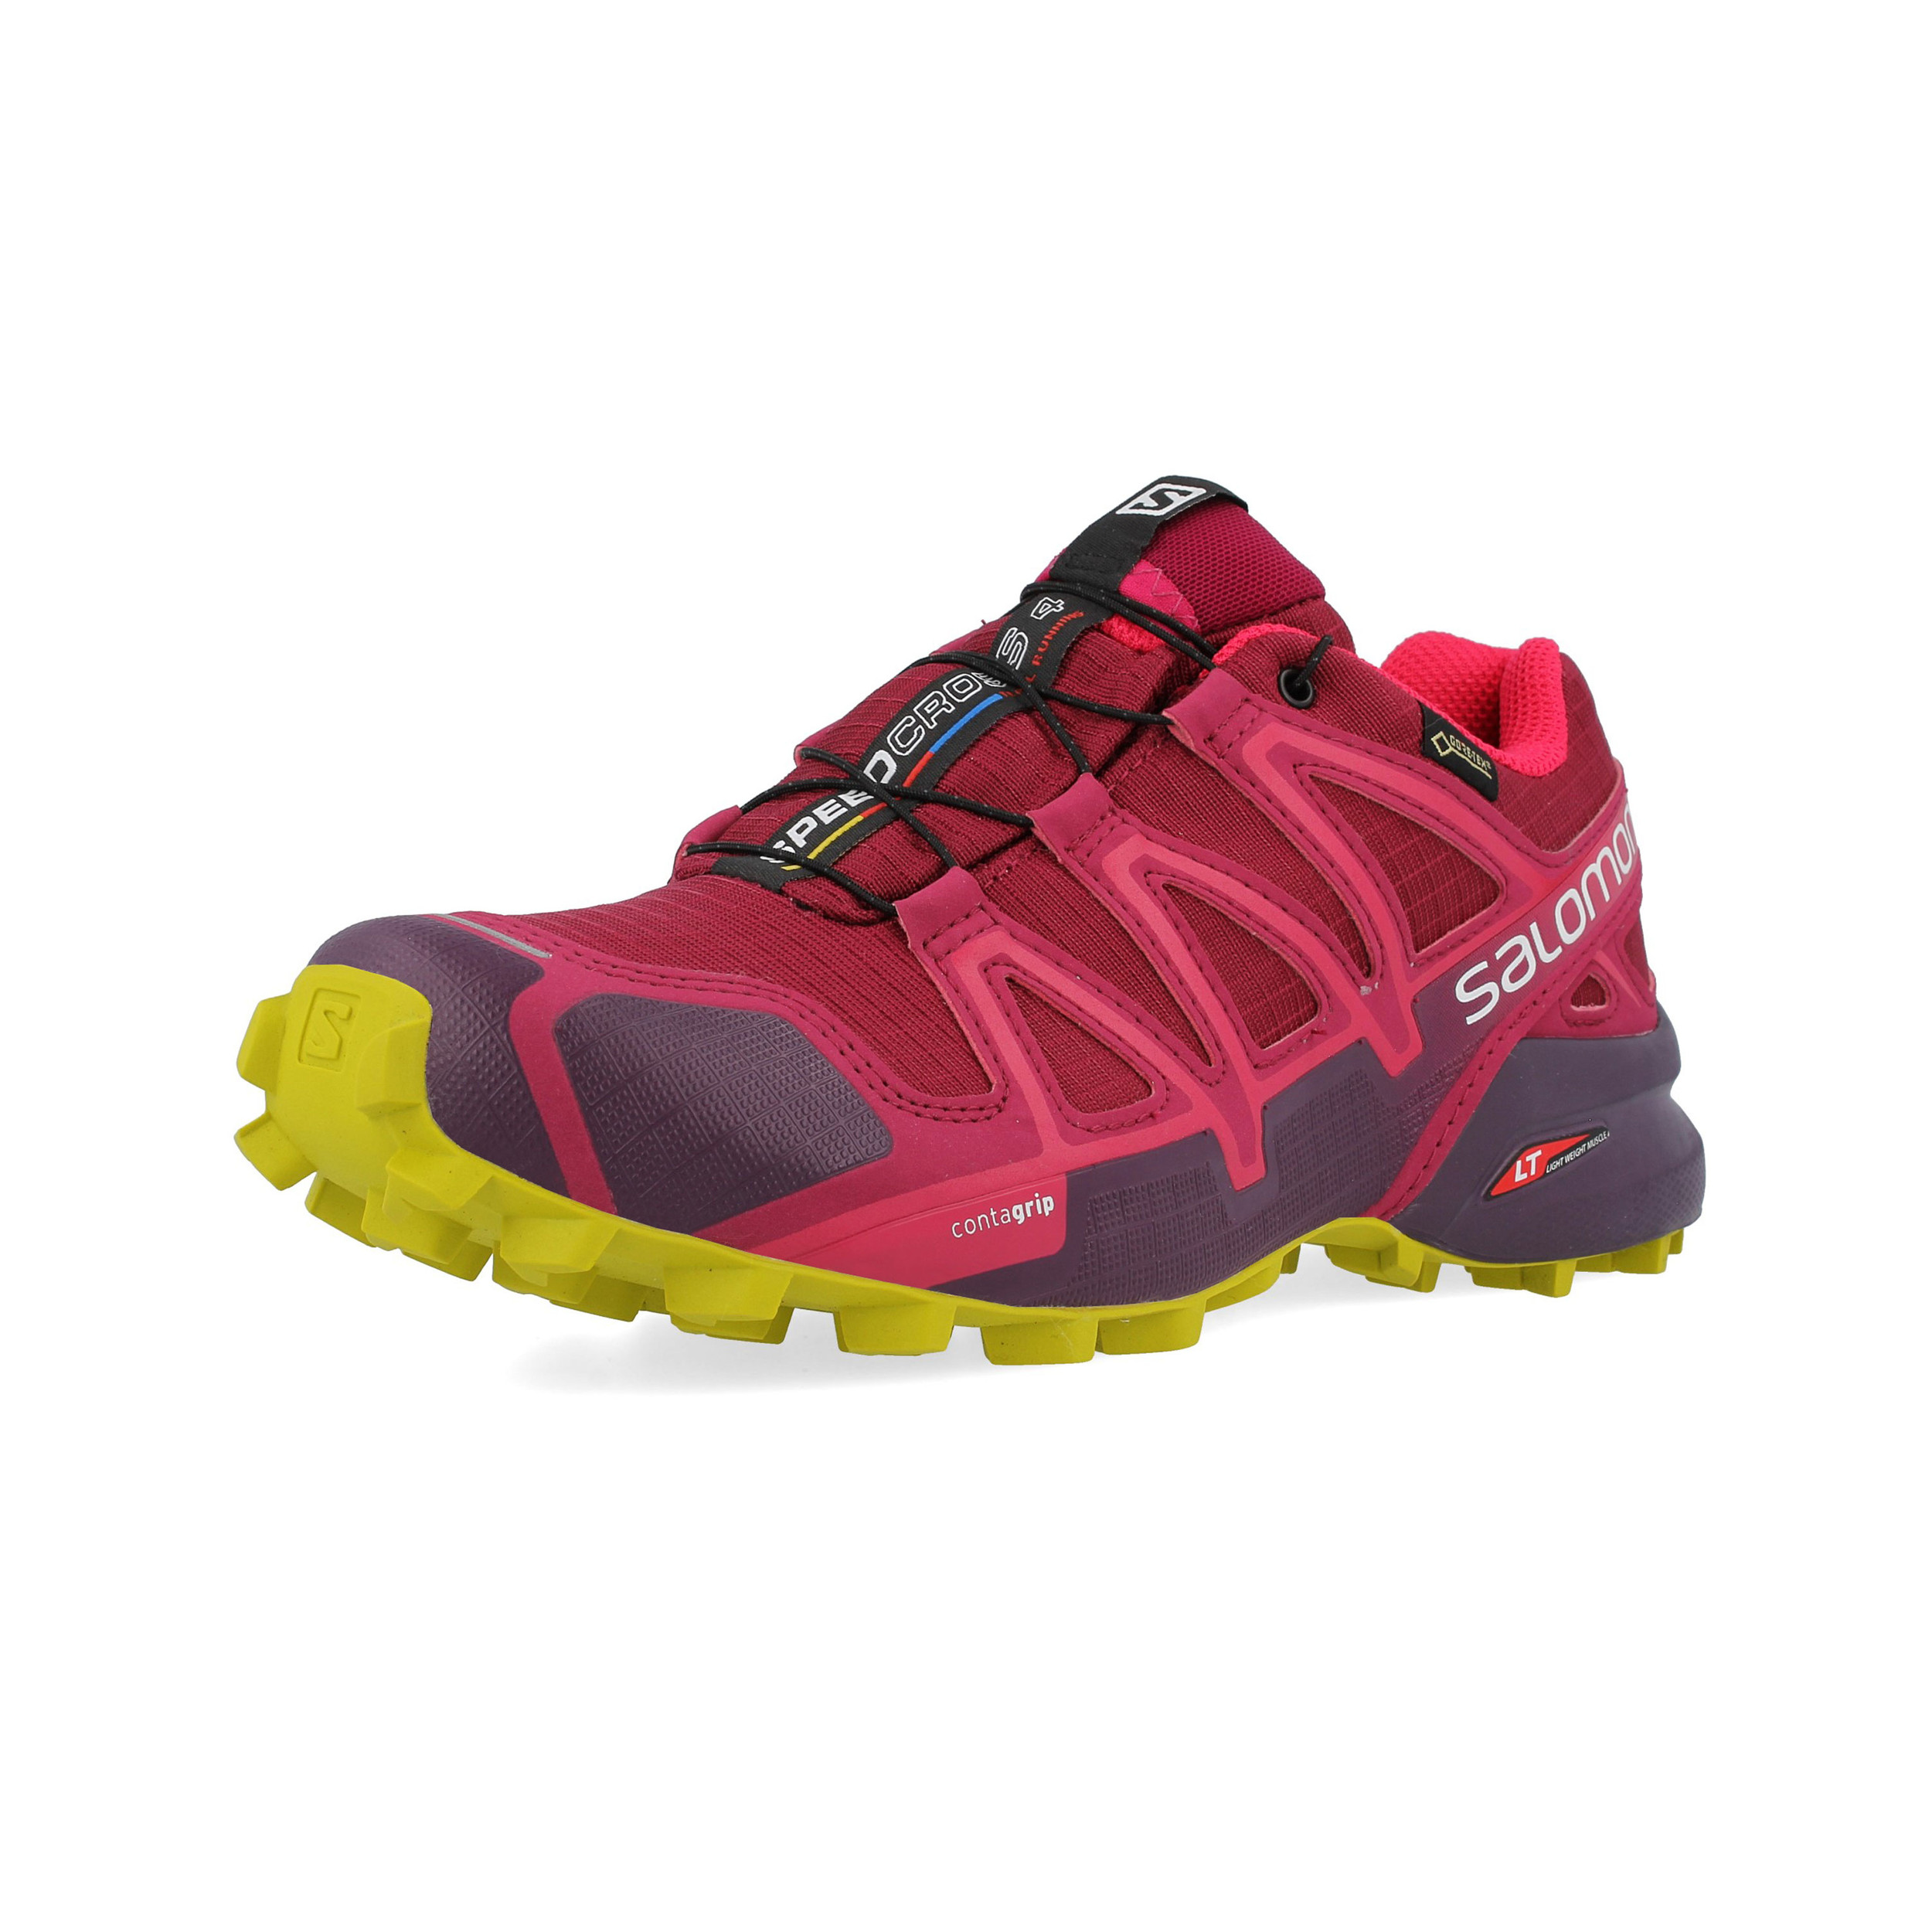 33f13c755d9 Salomon Mujer Speedcross 4 Gore-tex Sendero Correr Zapatos Zapatillas  Running